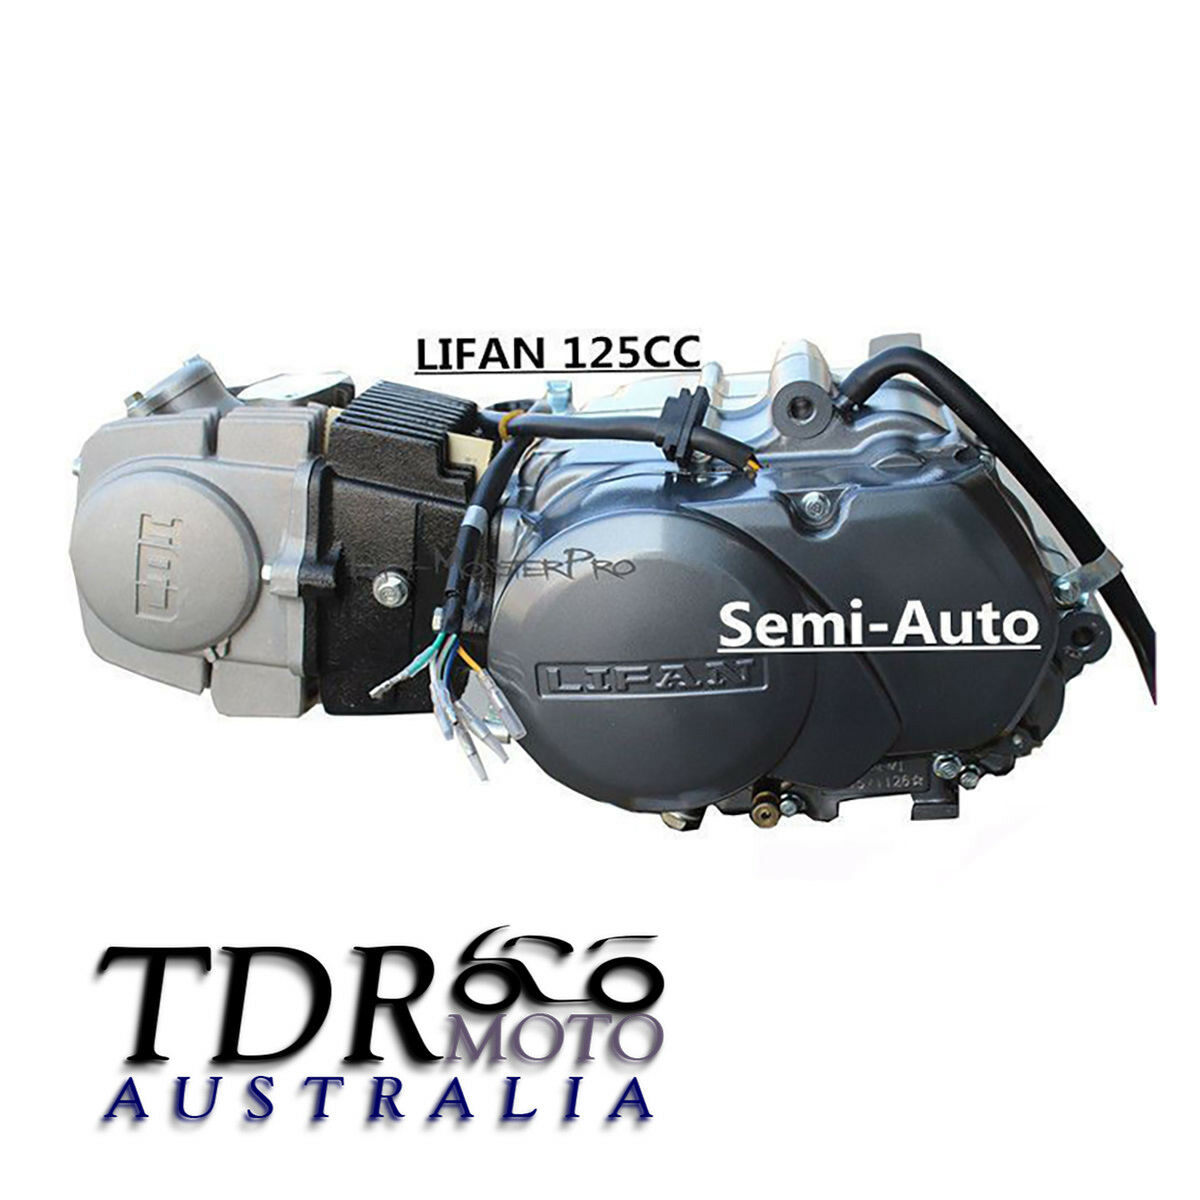 LIFAN 125CC Engine Kick Start Semi Auto for Thumpstar Atomik